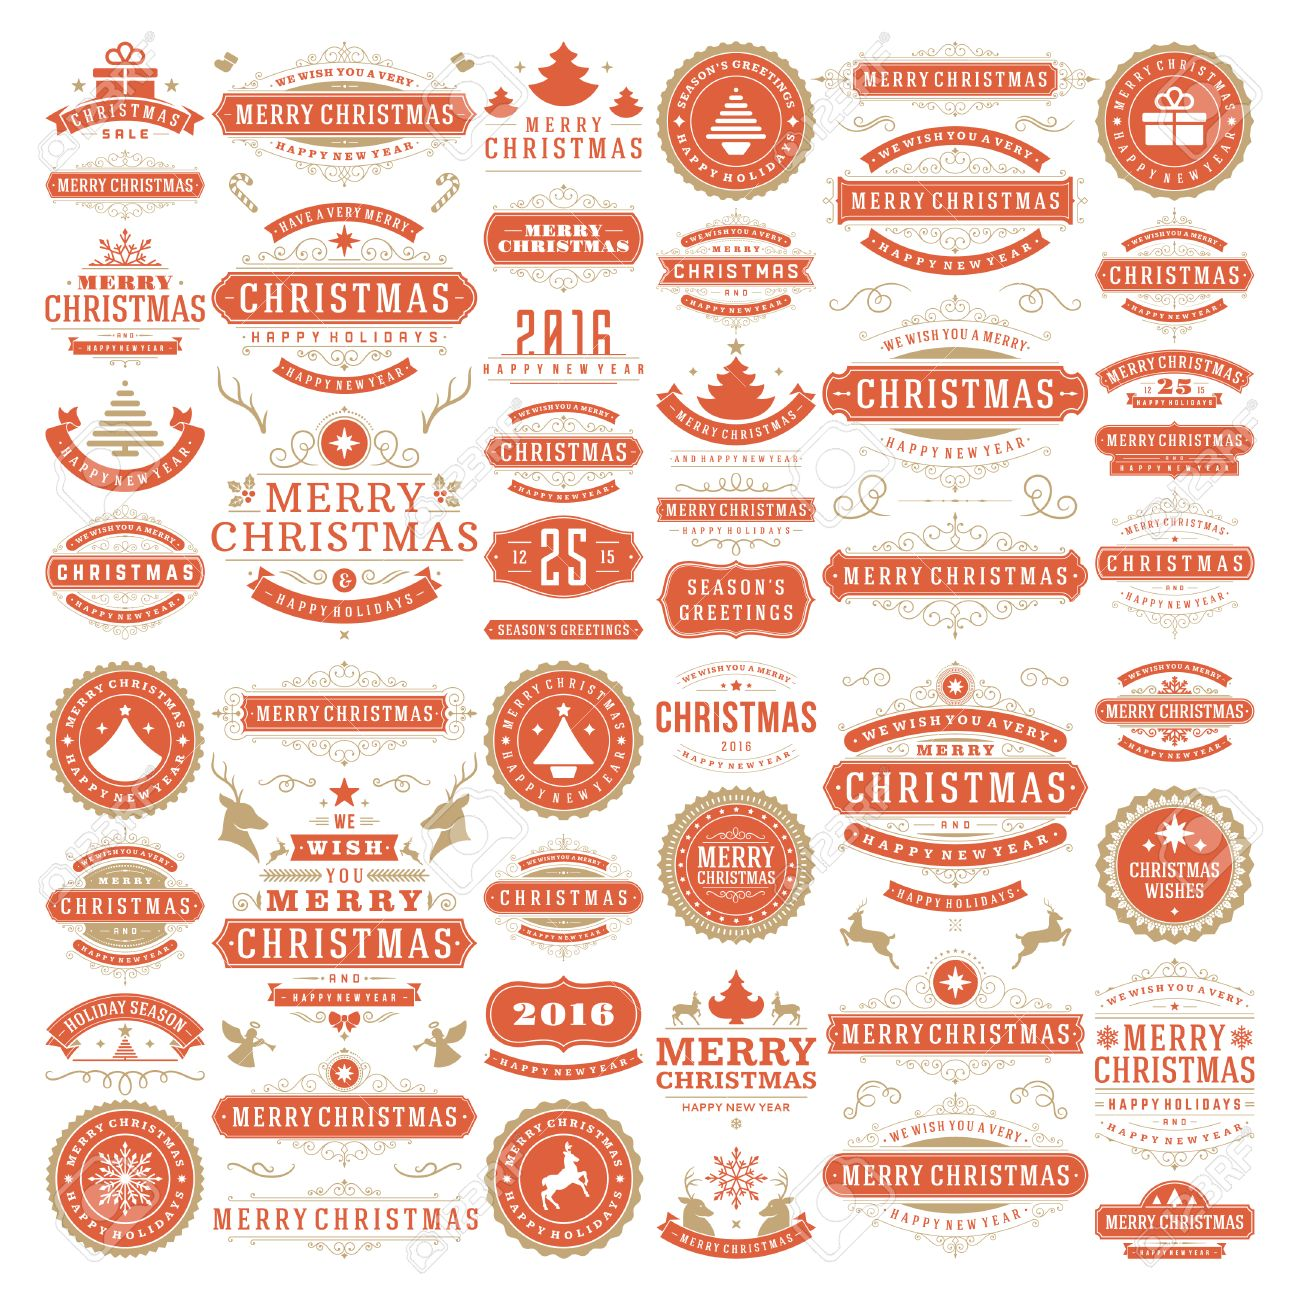 Christmas decorations vector design elements. Typographic messages, vintage labels, frames ribbons, badges logos, ornaments set. Flourishes calligraphic. Big Collection. - 46920542